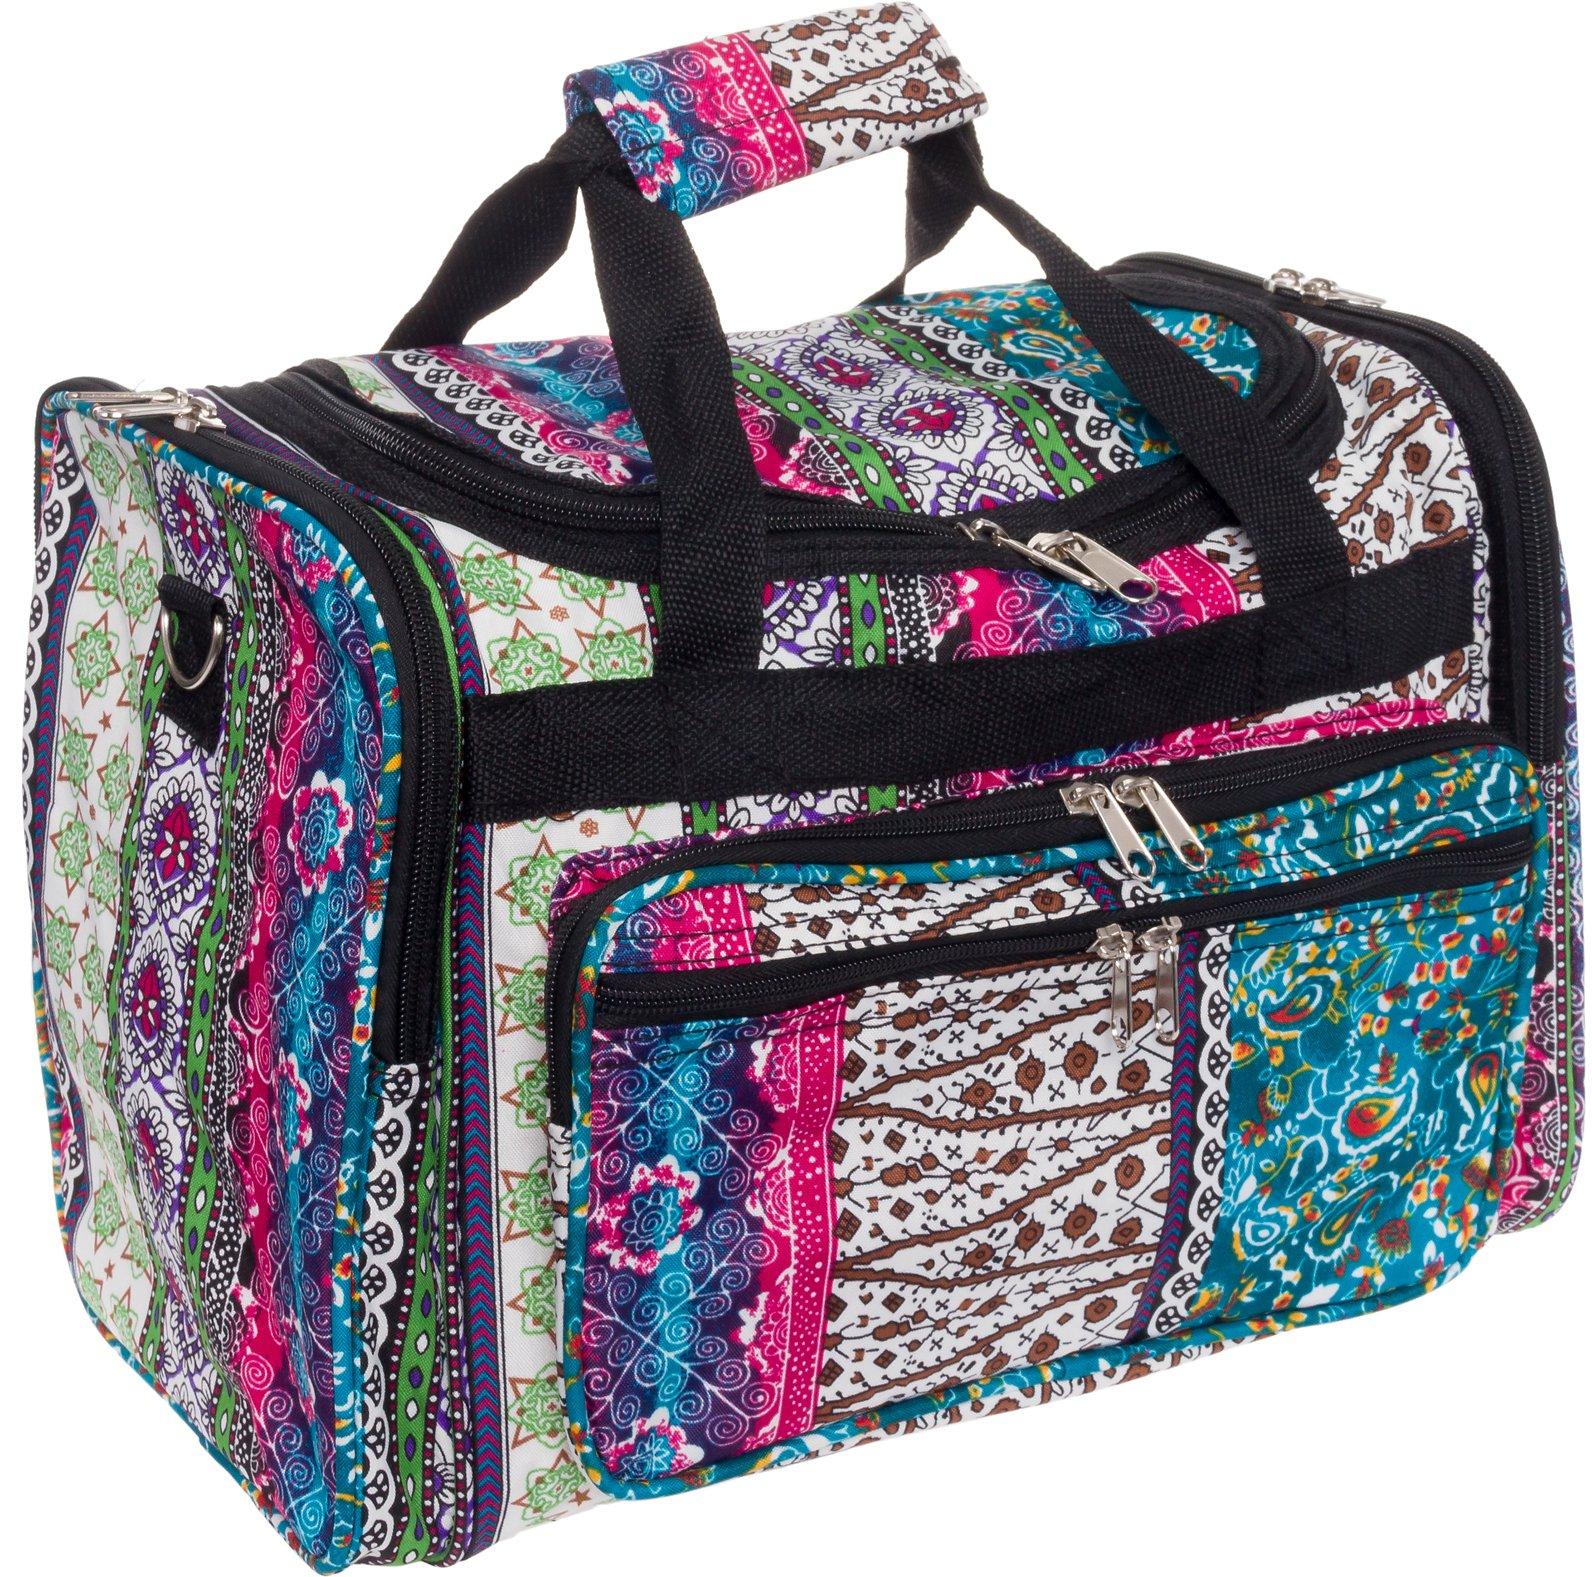 Womens 16'' Duffel Carry-On Travel Bag (Bohemian w/Black Trim)